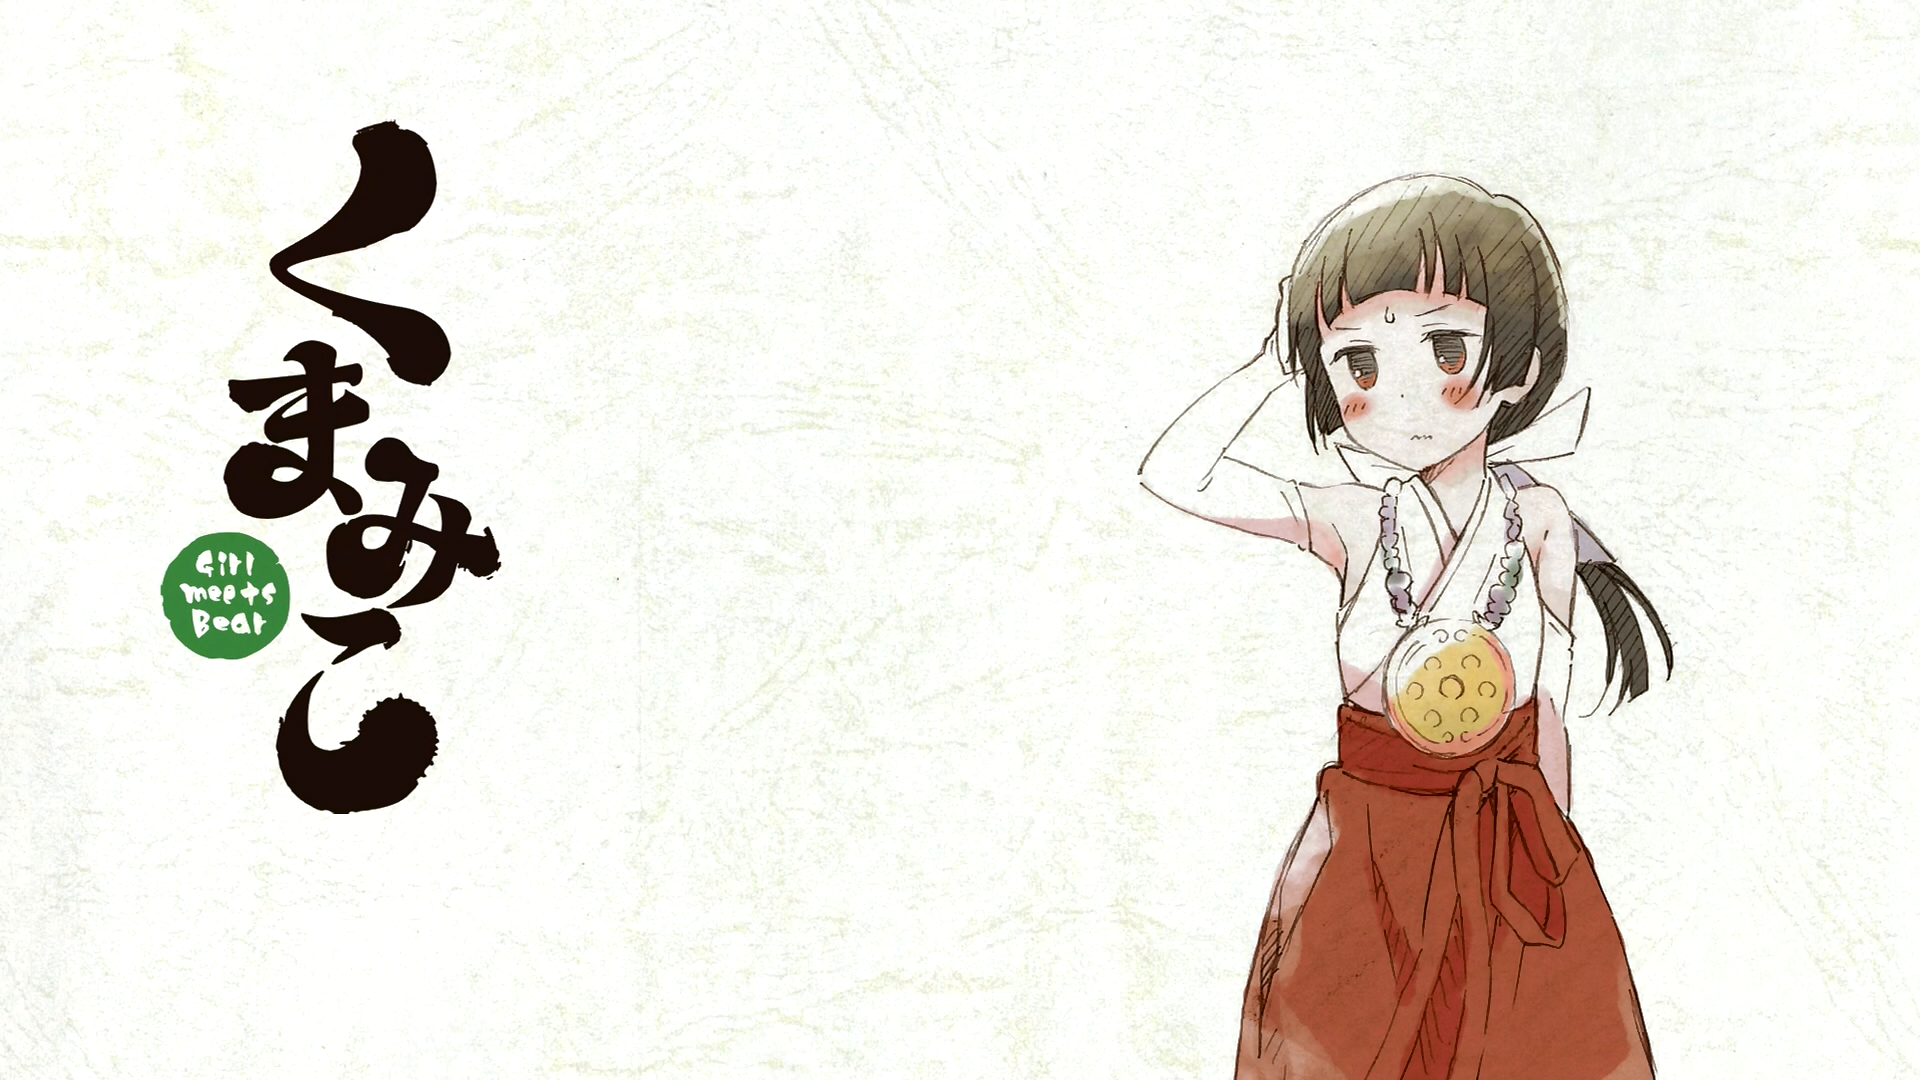 Anime 1920x1080 Kuma Miko anime girls Machi Amayadori